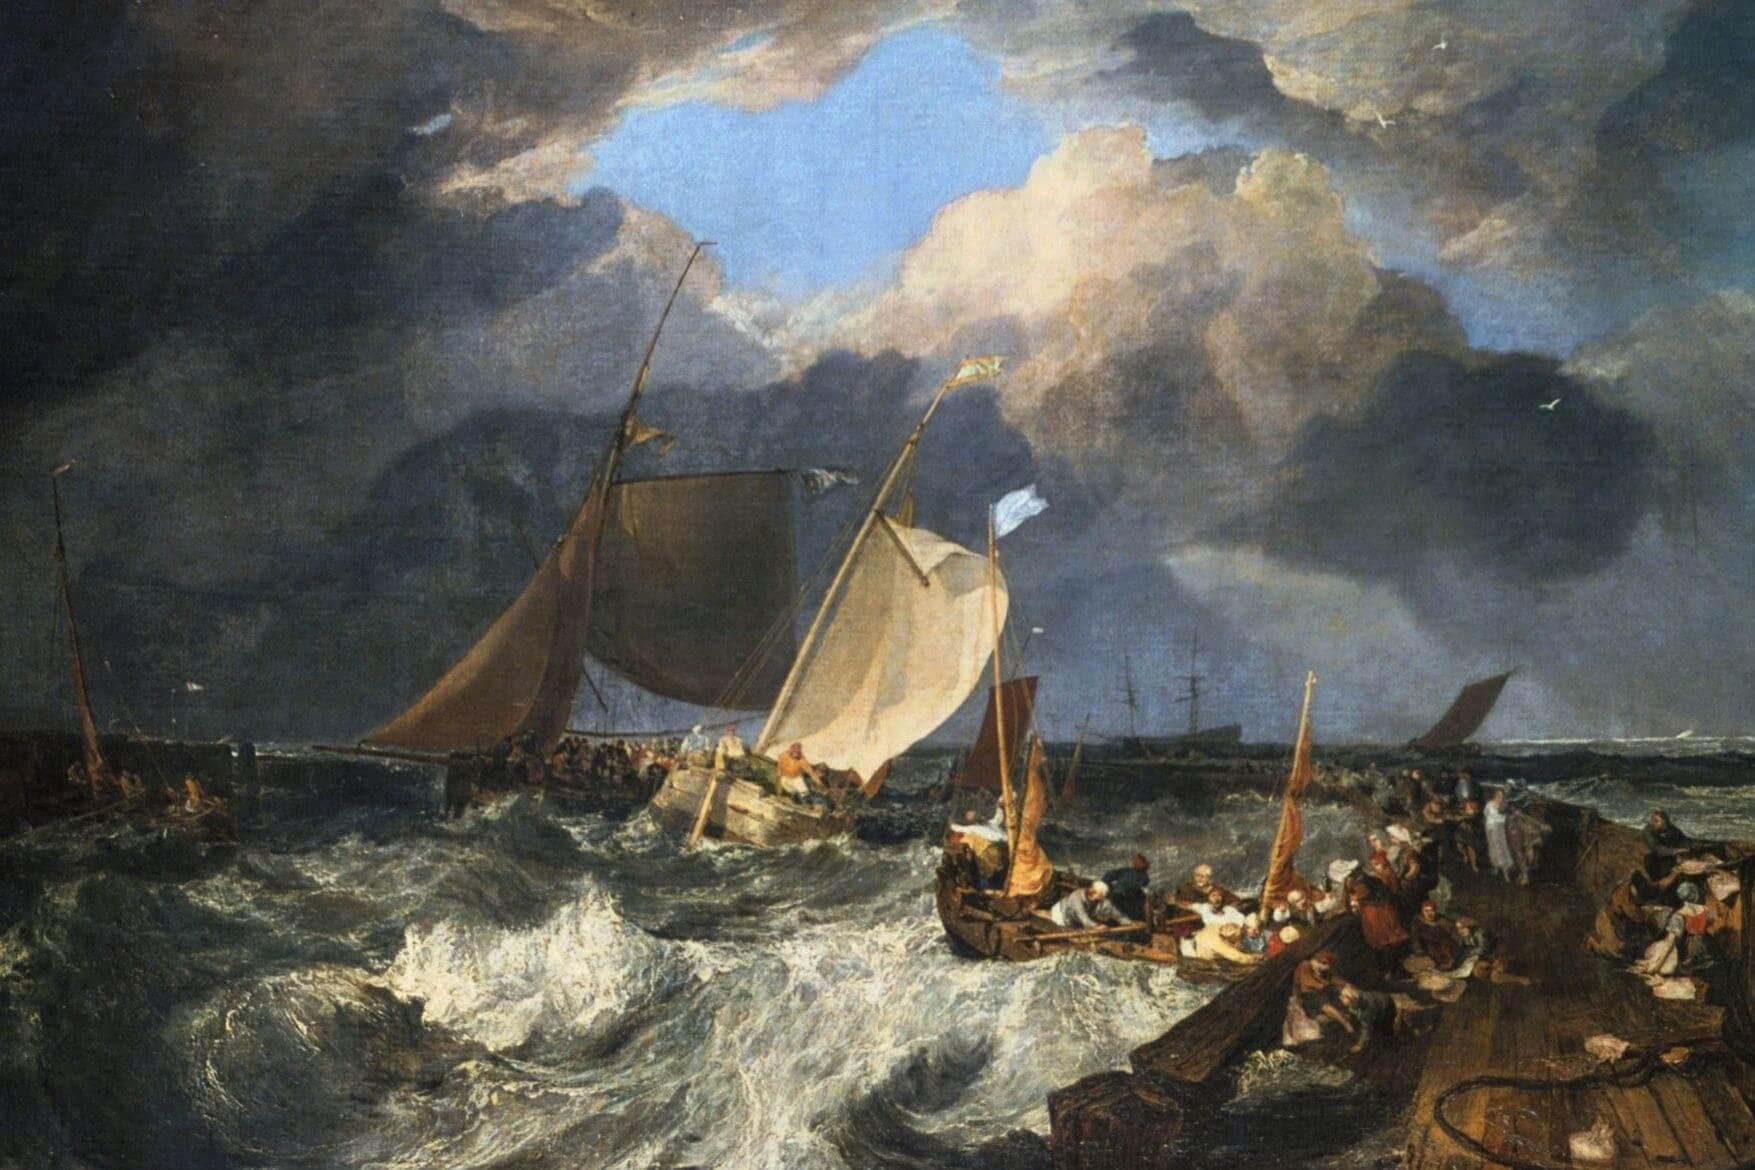 J.M.W. Turner – Calais-Pier